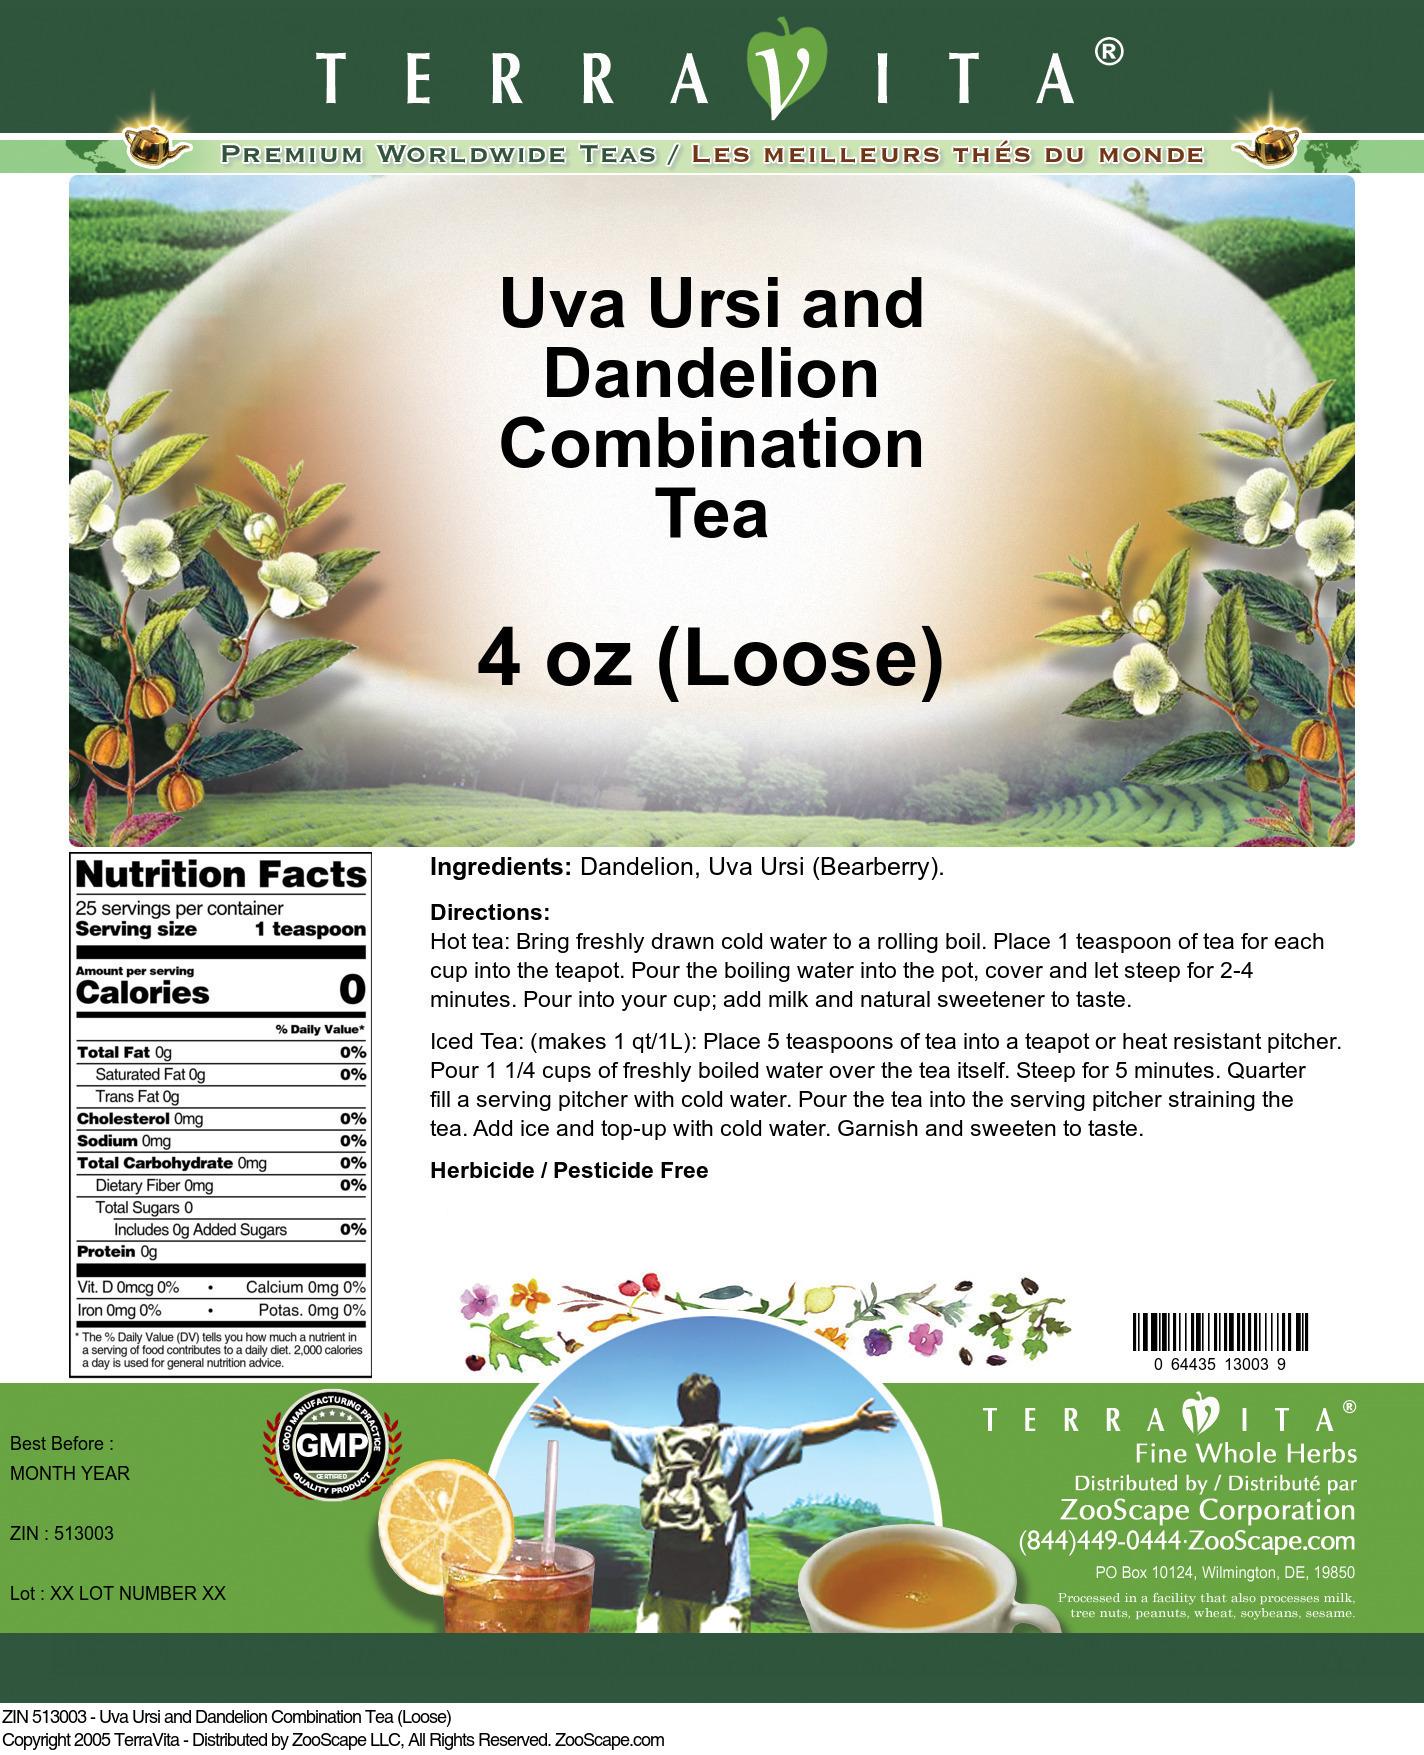 Uva Ursi and Dandelion Combination Tea (Loose)